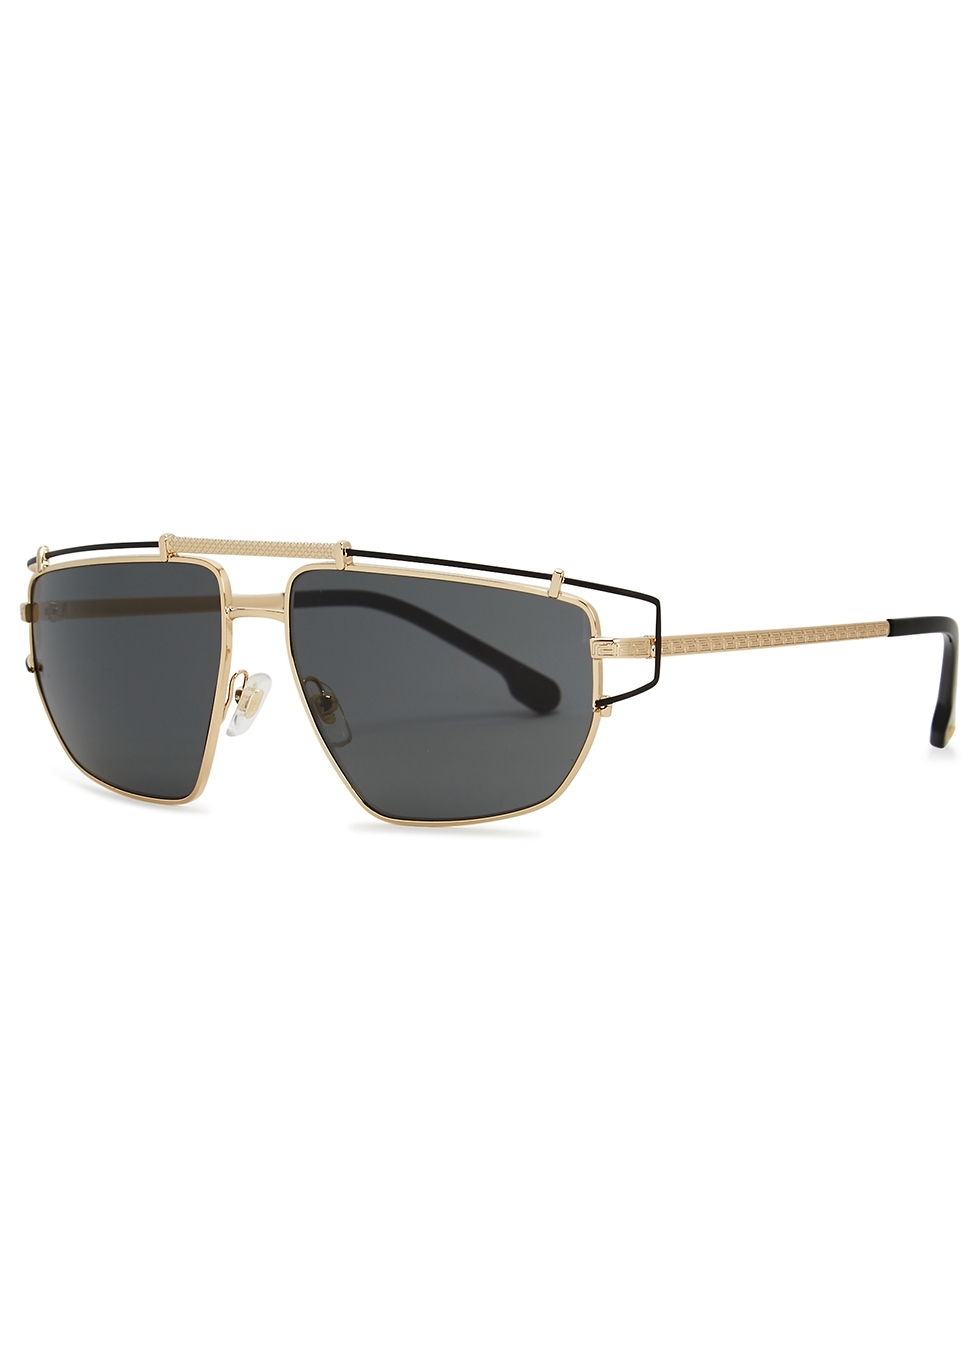 527b1ed9f72 Women s Designer Sunglasses and Eyewear - Harvey Nichols